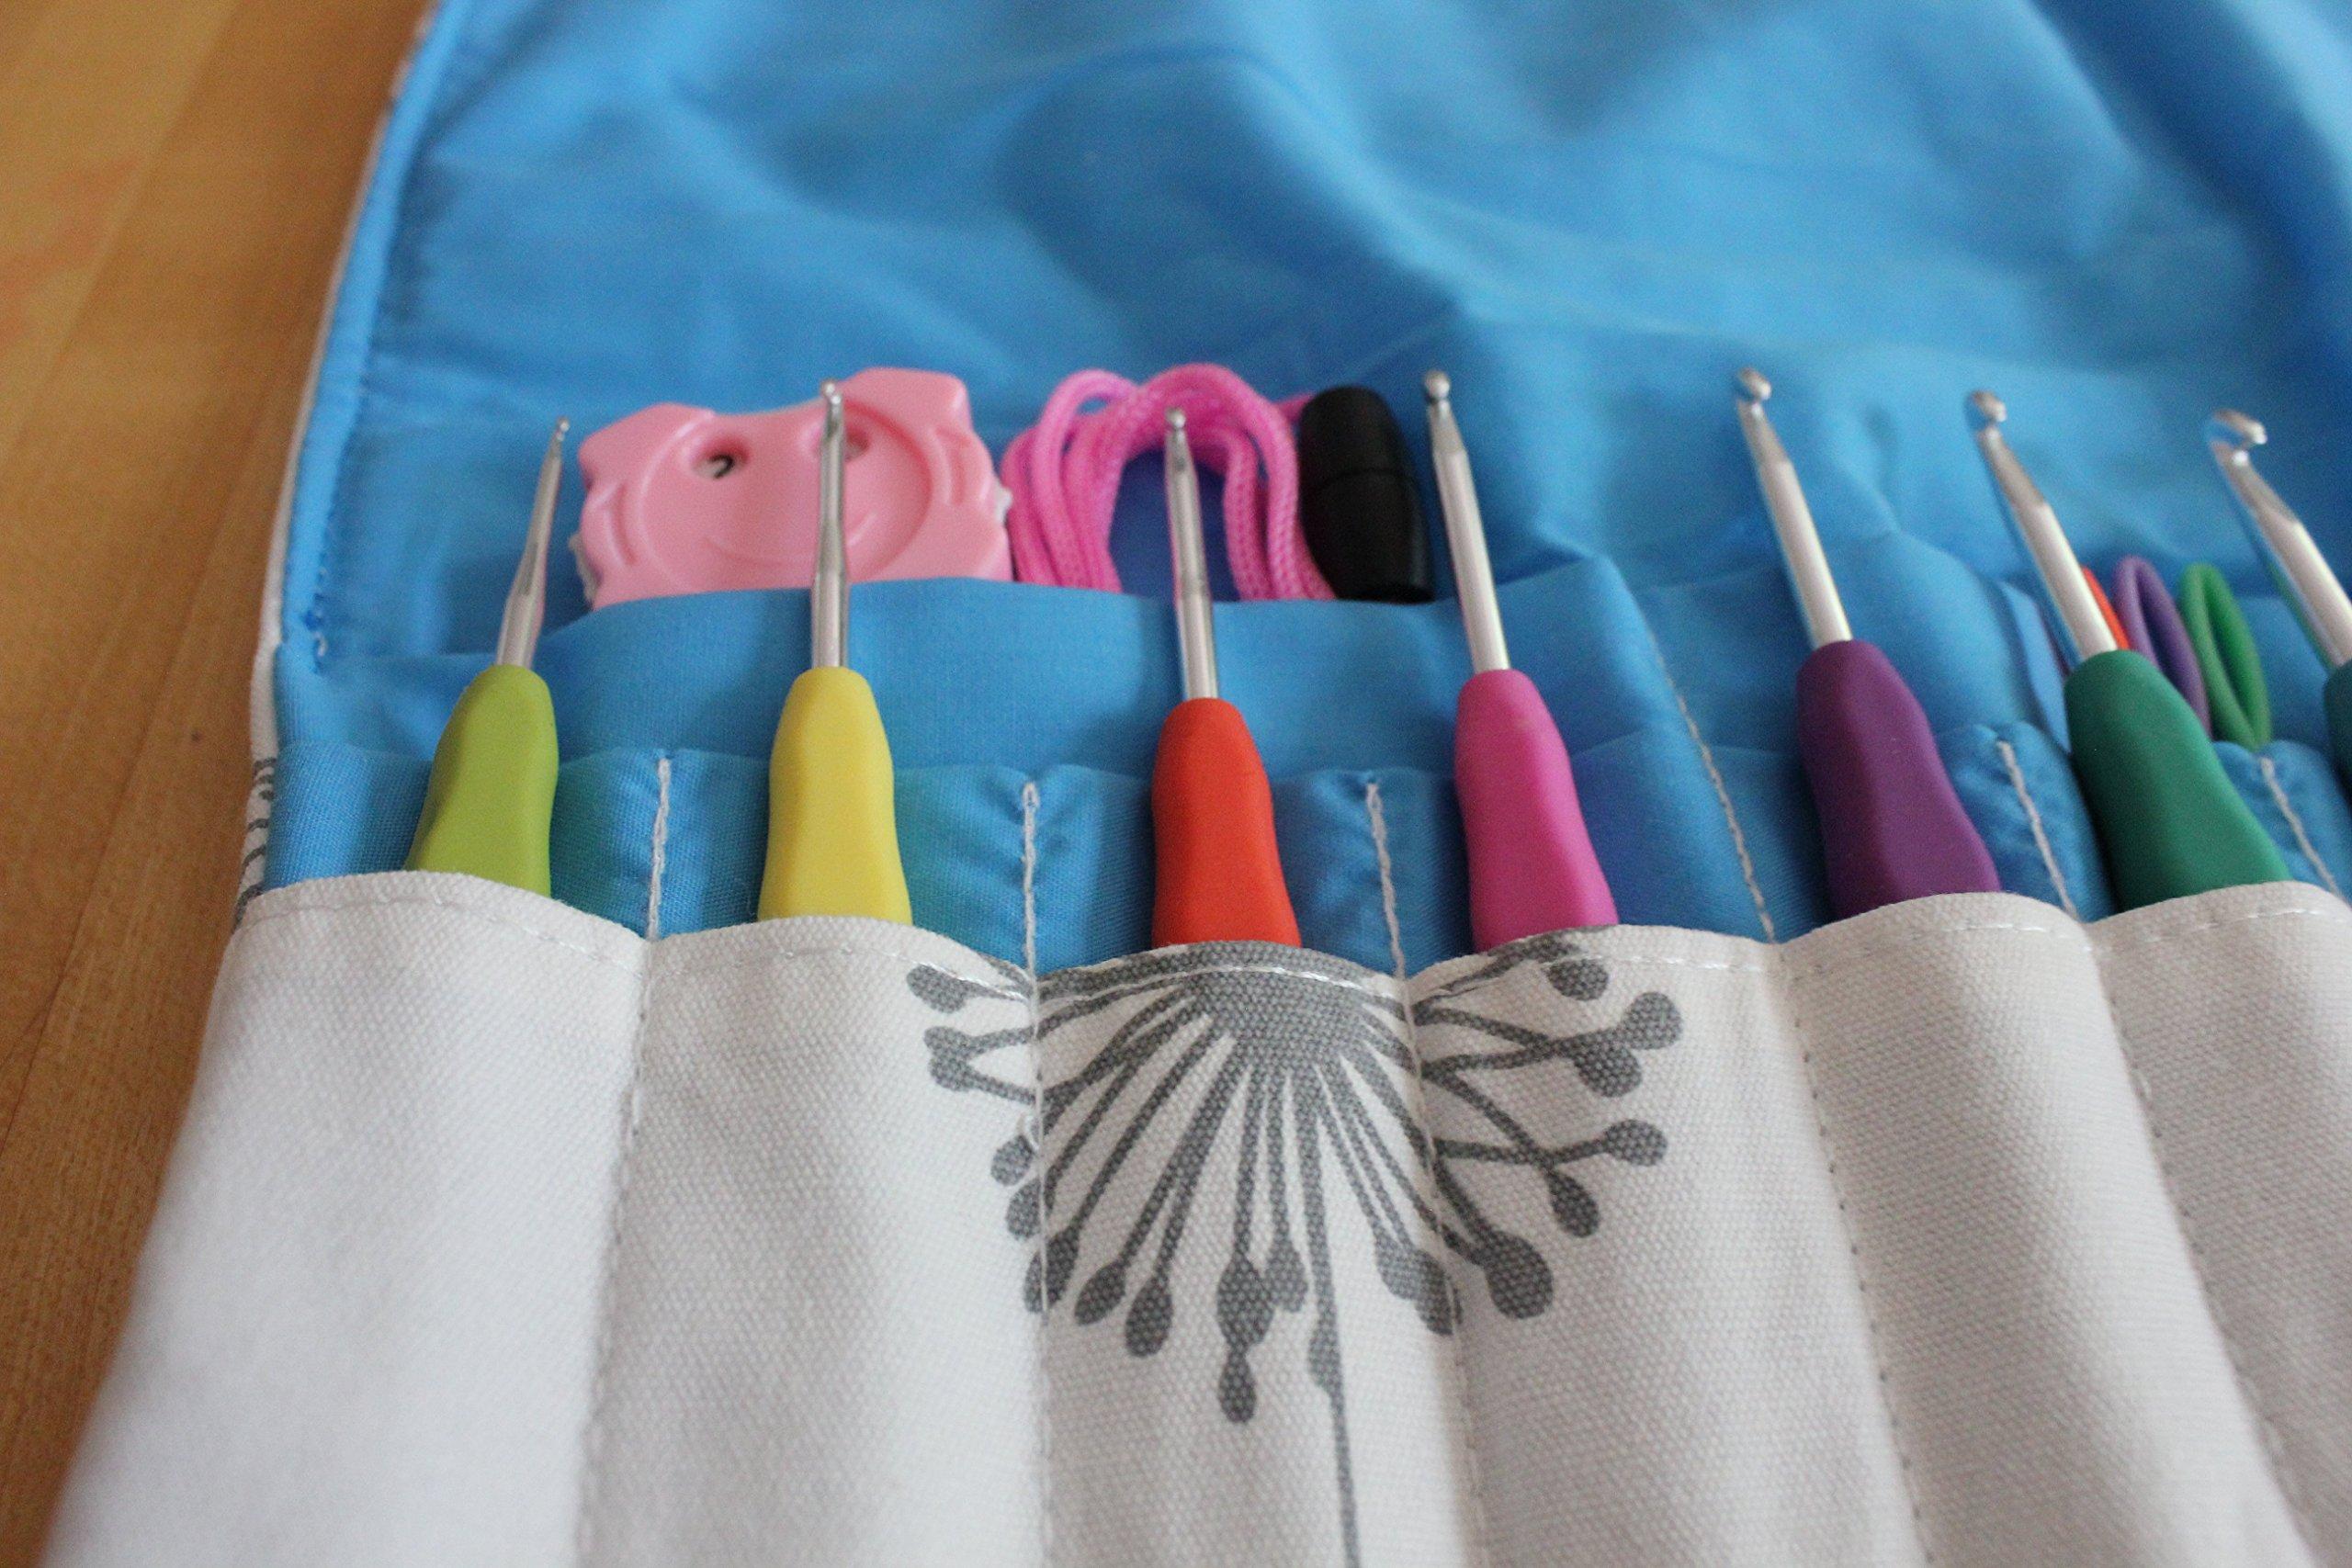 Sparkling Pumpkin Crochet Set - Ergonomic Crochet Hook Set with Multiple Accessories - Blue Floral Hook Case, Yarn Needles, Stitch Markers, Measuring Tape & More! (36 Piece Set, Dandelion)